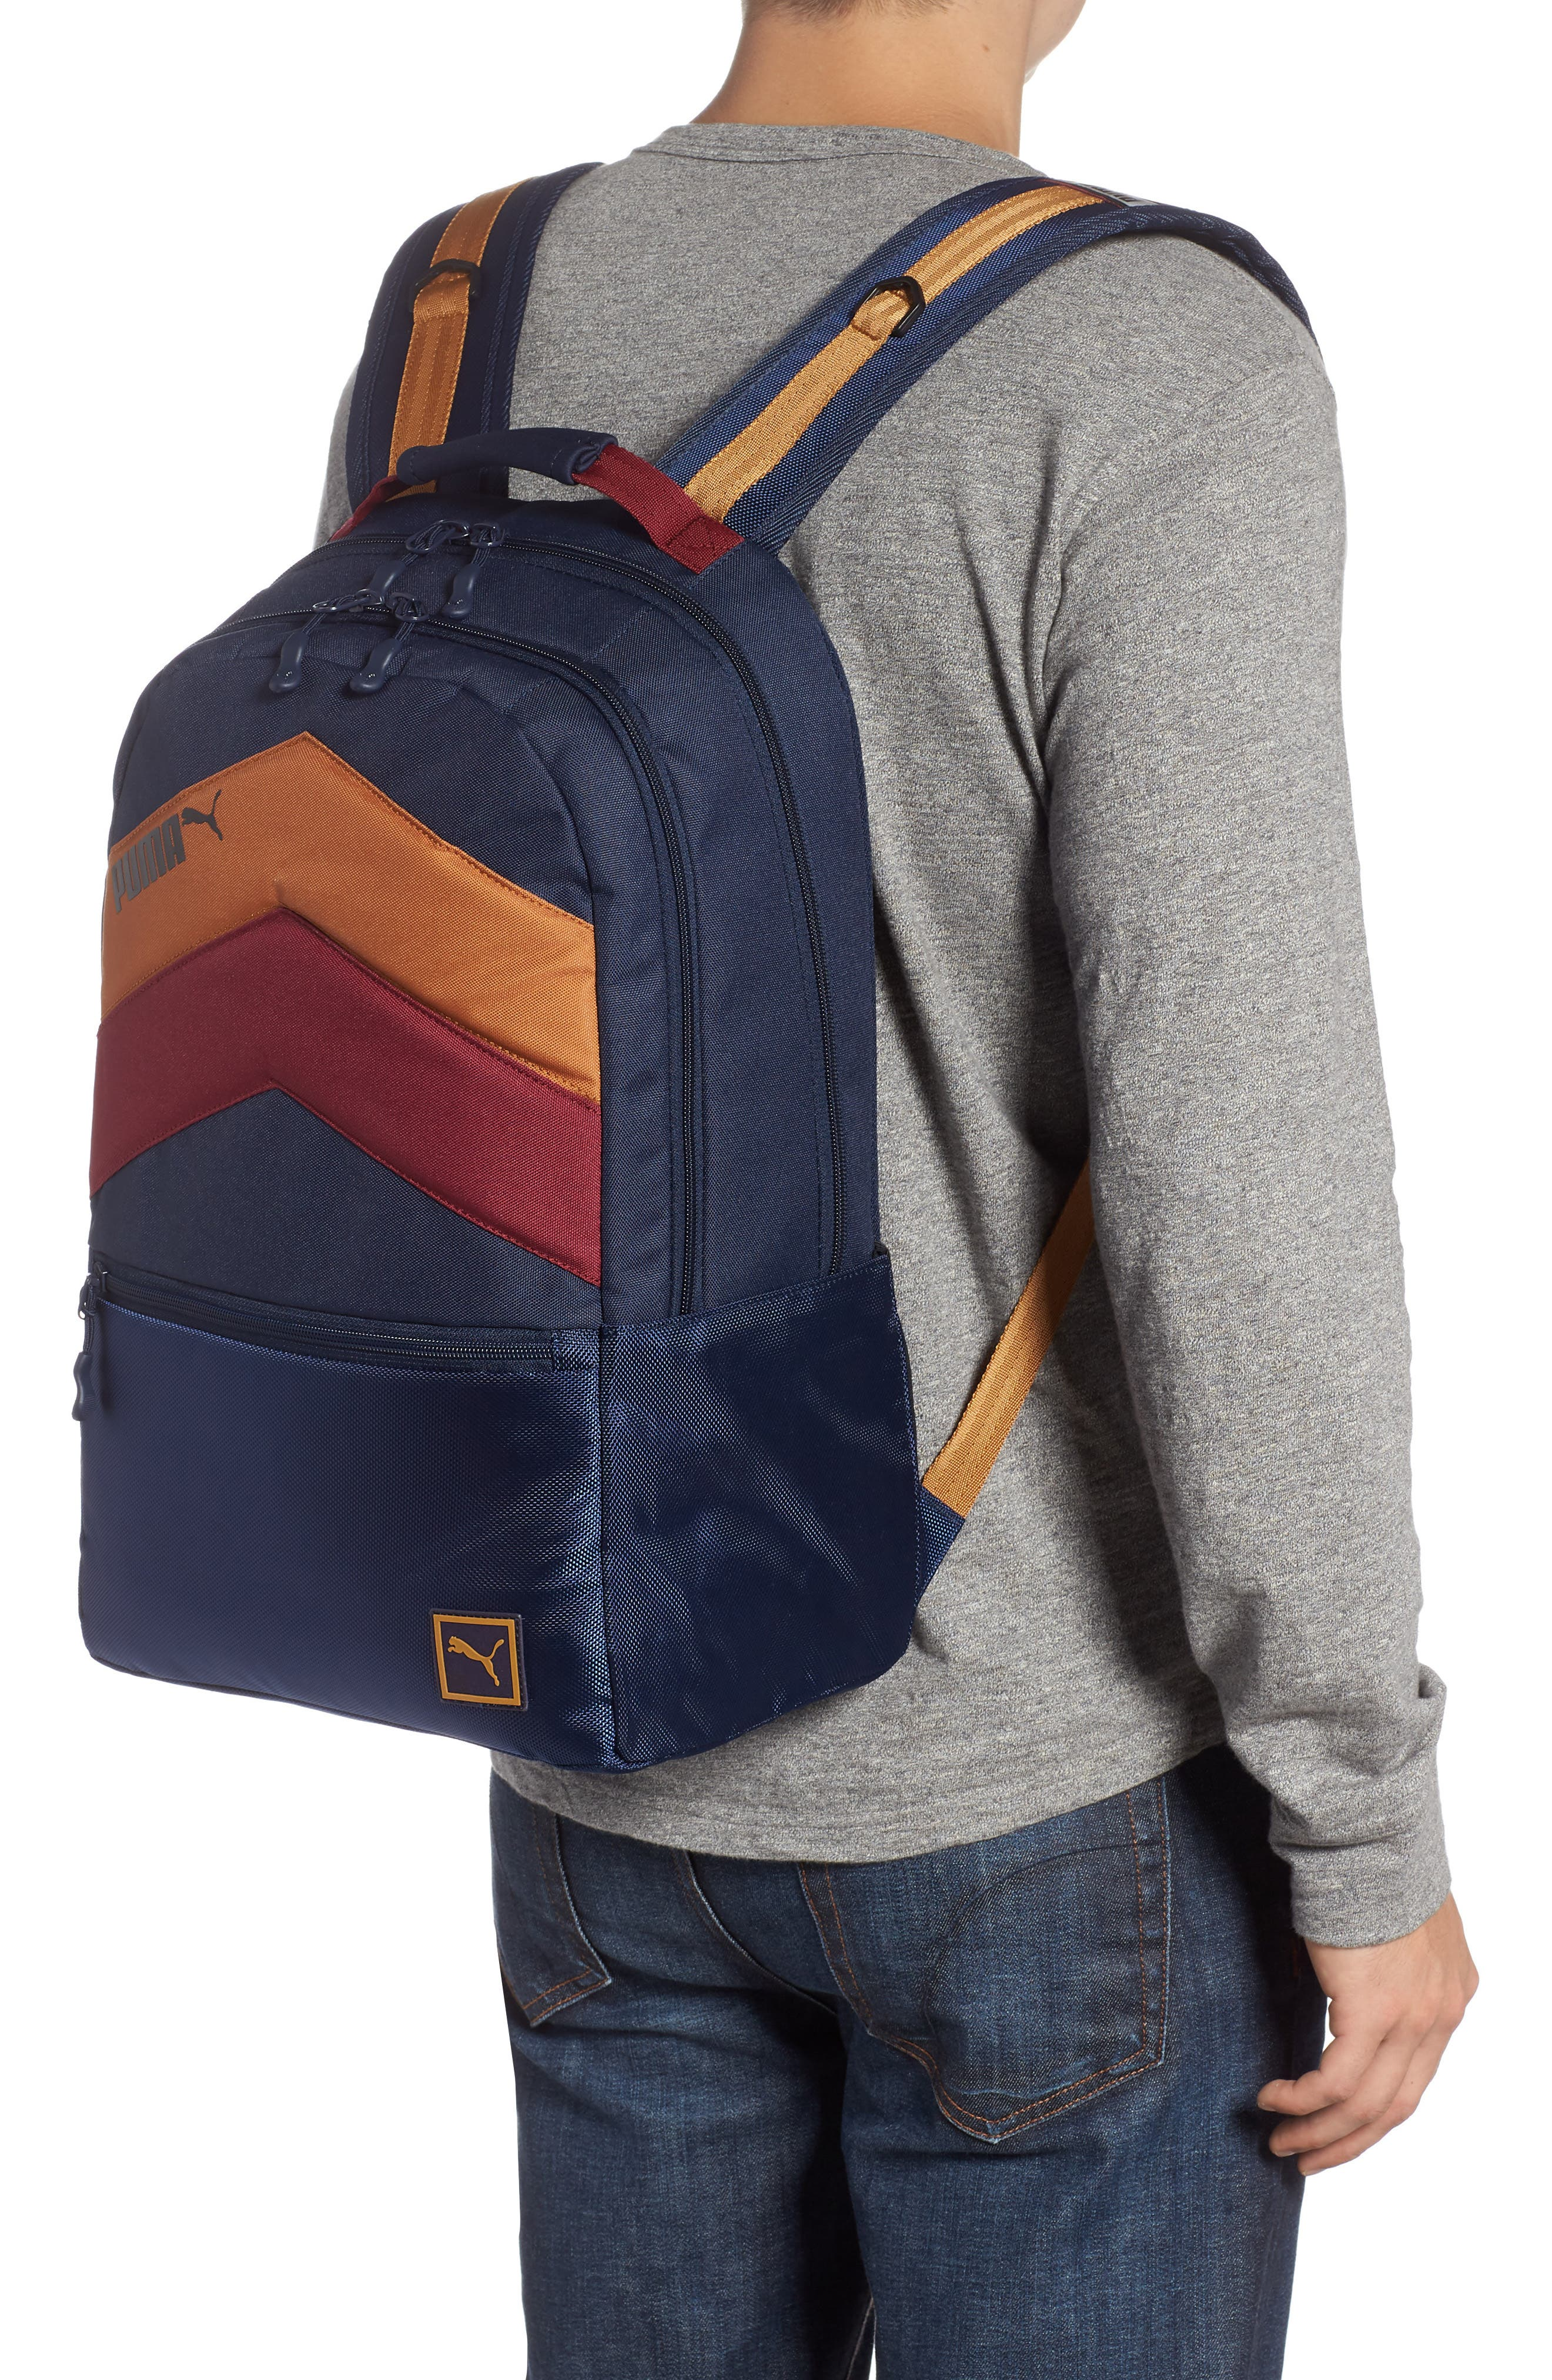 PUMA,                             Ready Backpack,                             Alternate thumbnail 2, color,                             NAVY